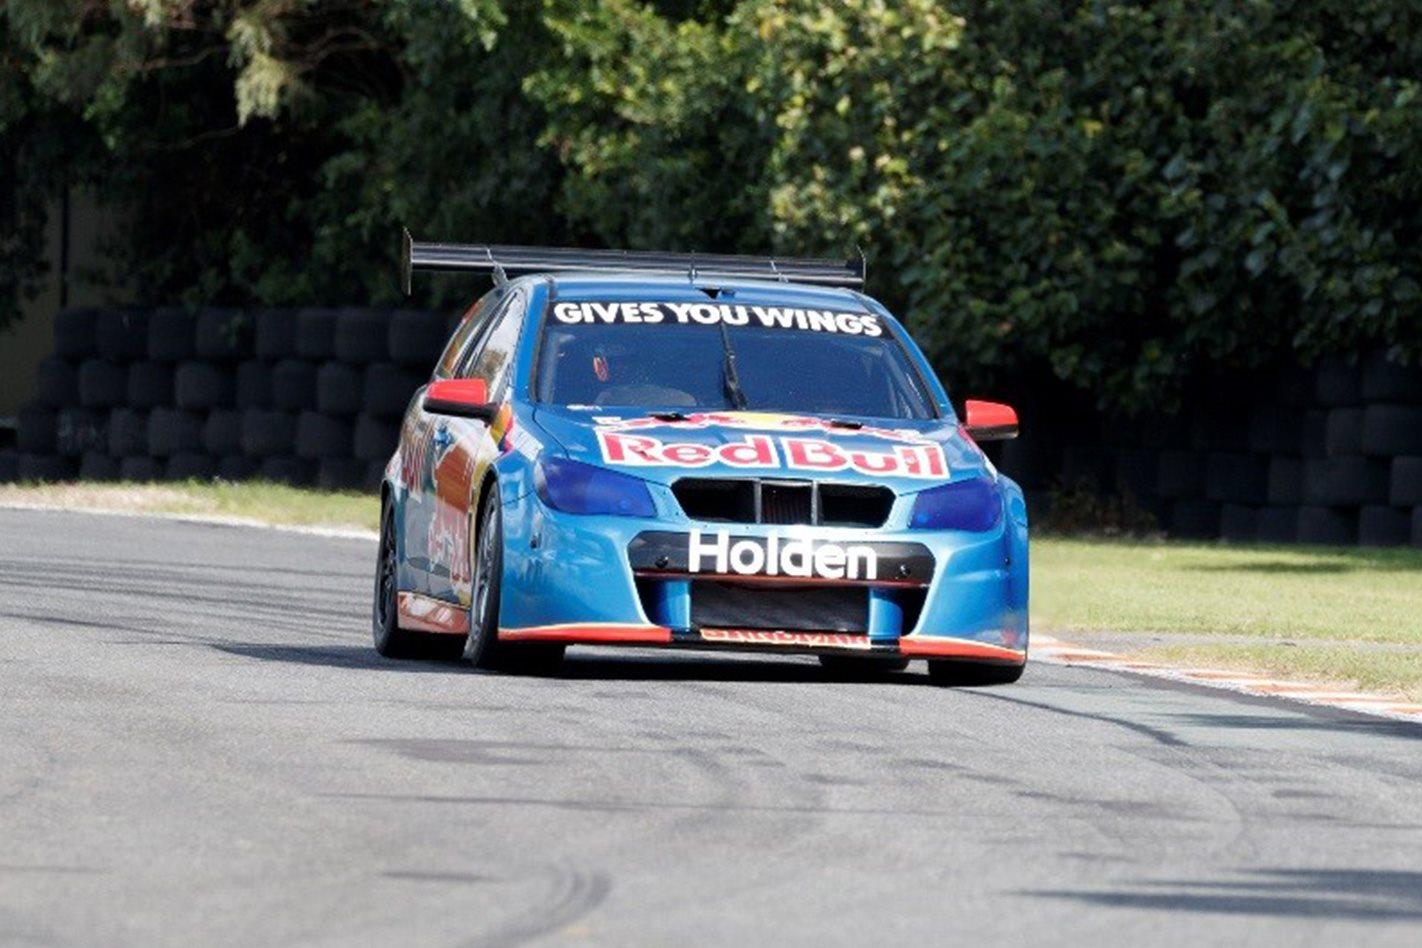 Holden v6 Supercar driving